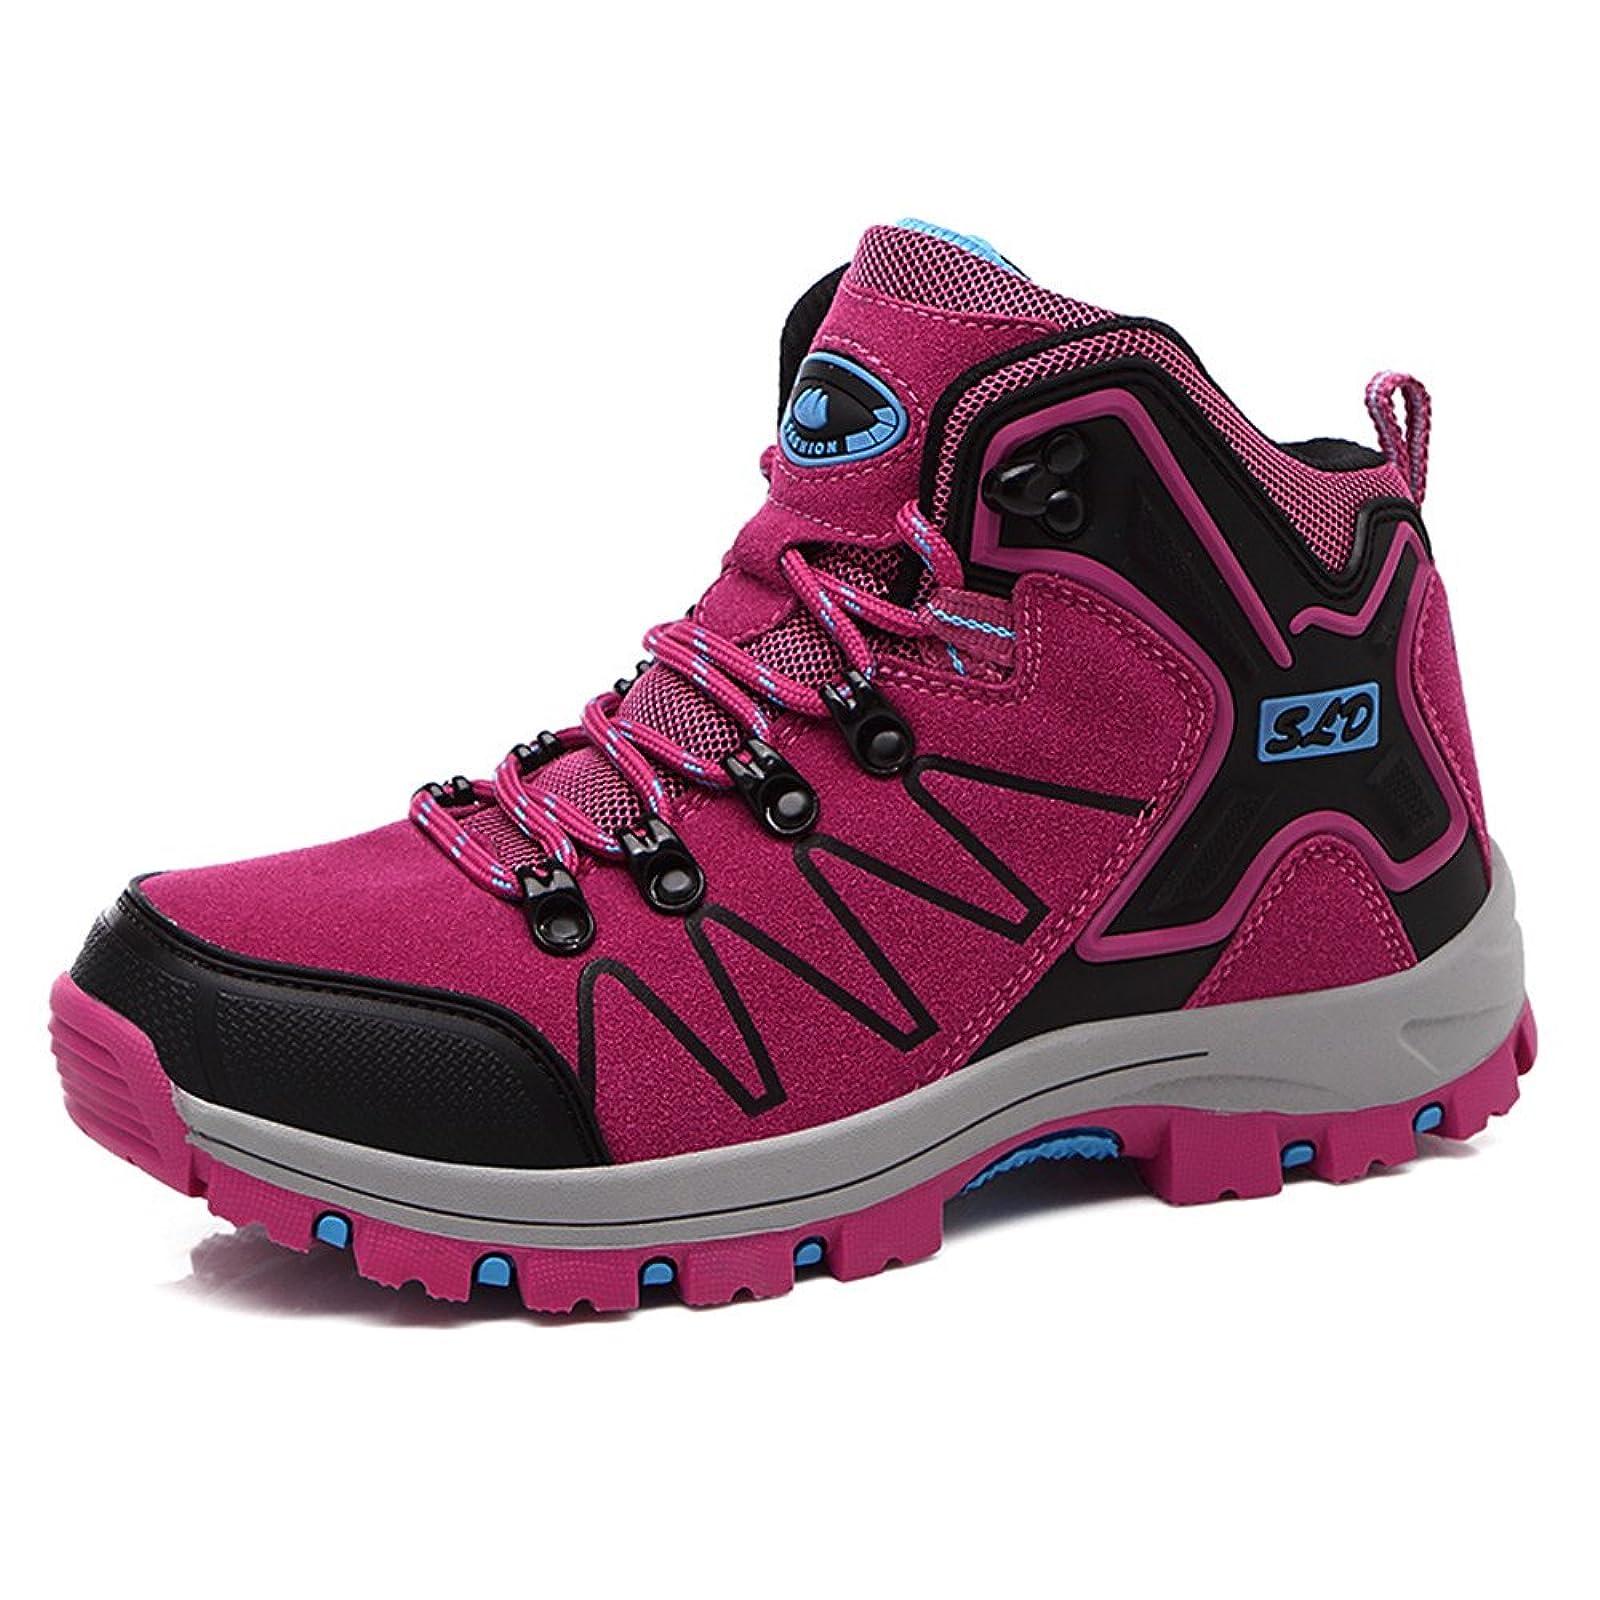 FEOZYZ Womens Hiking Boots Trekking Shoes Anti- QLMXZY's 1008 - 9